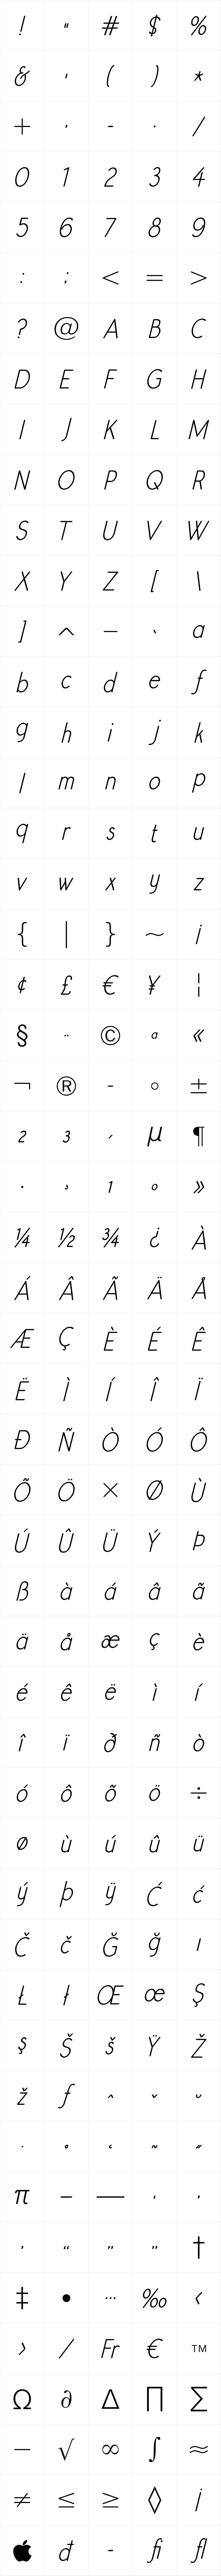 Register Sans BTN Condensed Oblique